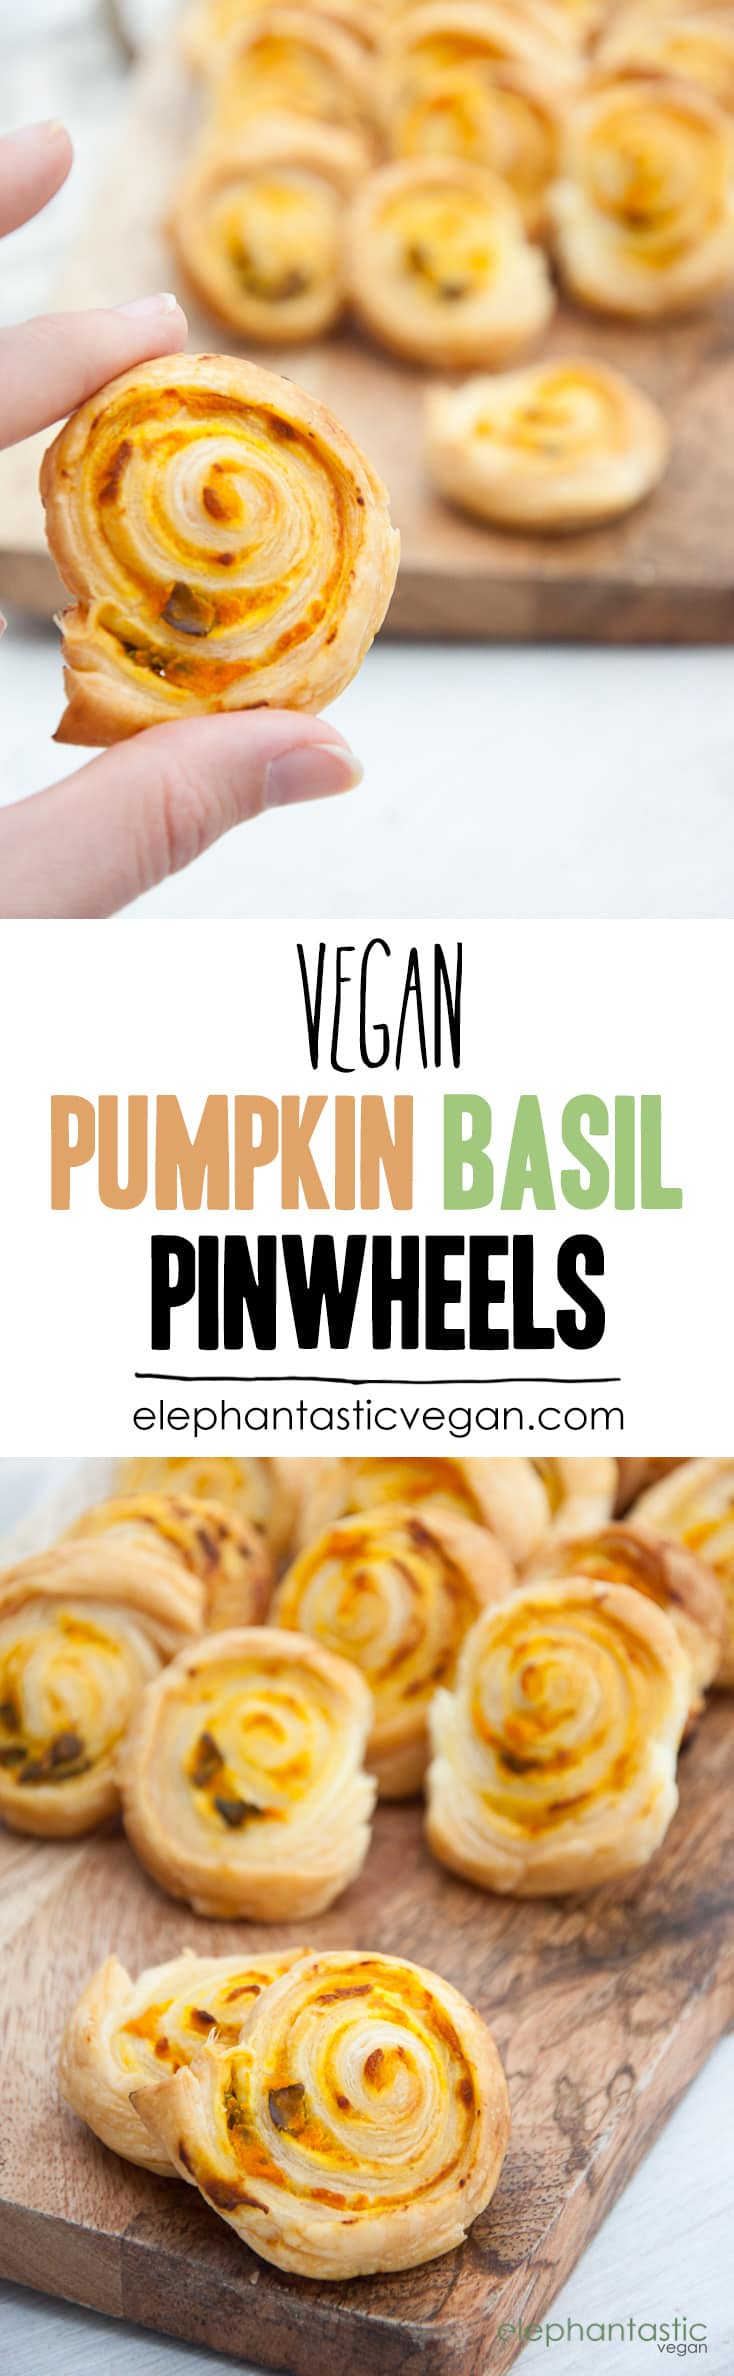 Vegan Pumpkin Basil Pinwheels | ElephantasticVegan.com